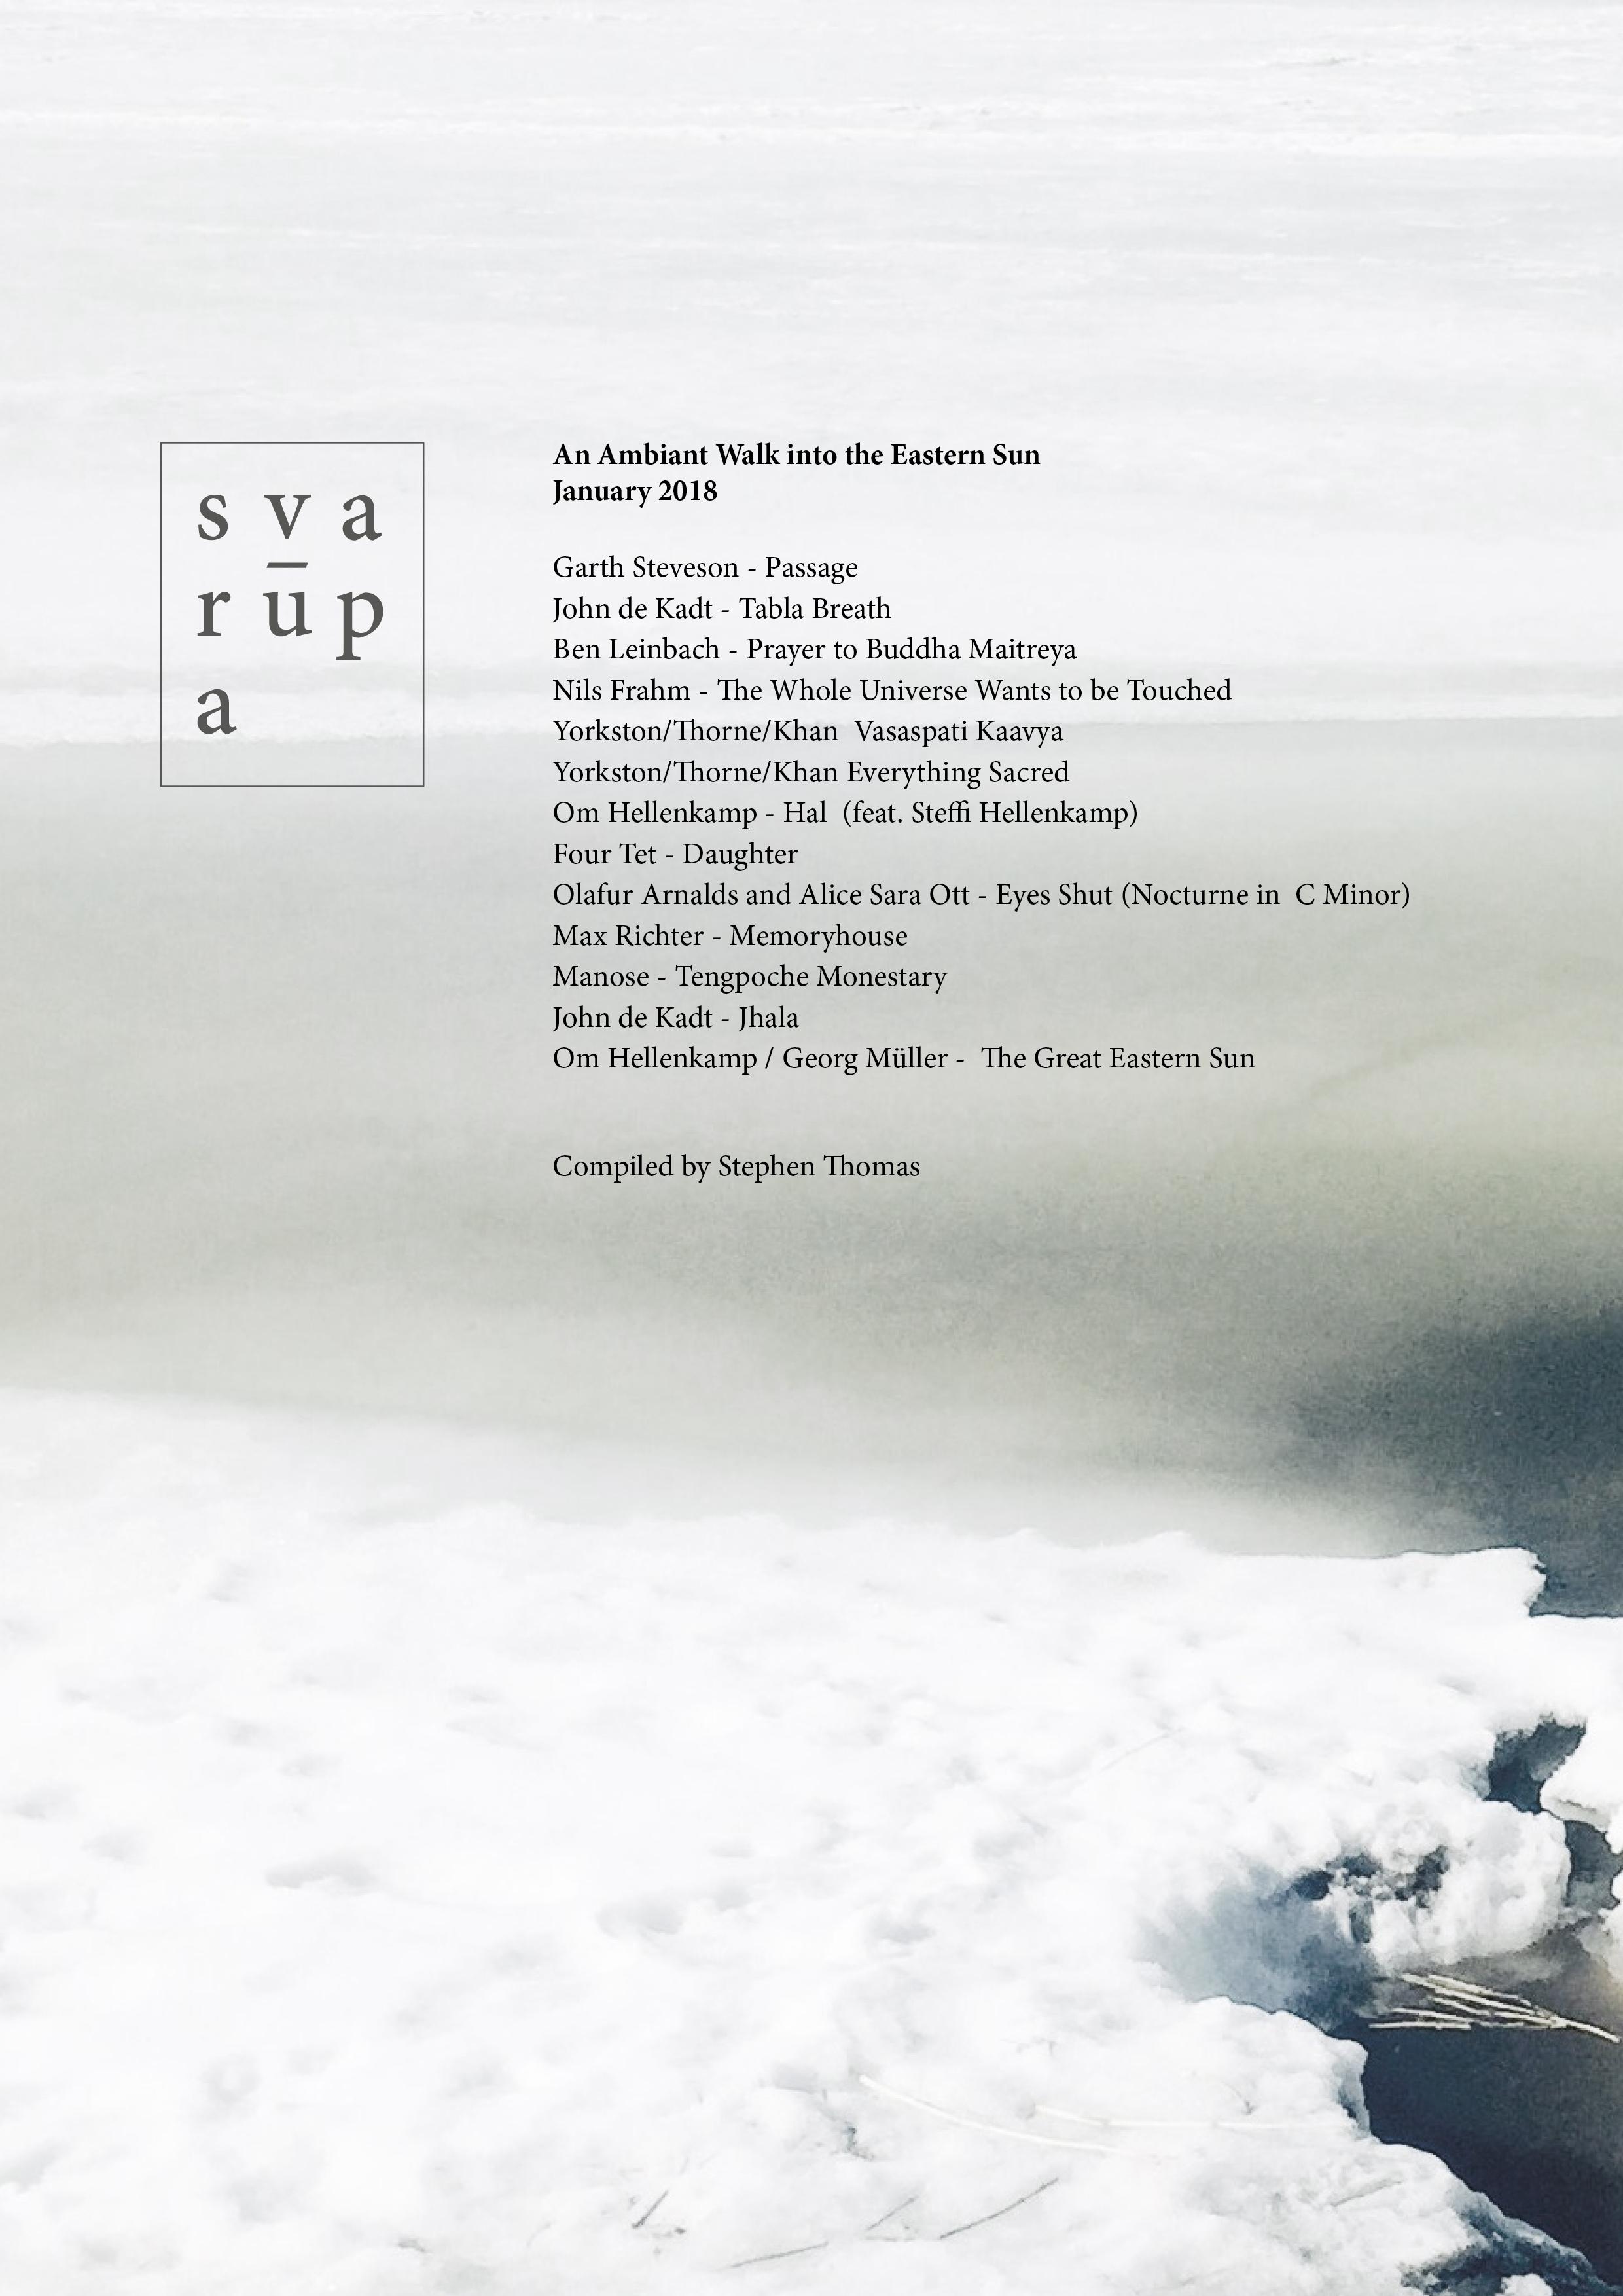 Playlists_January18_Stephen Thomas.jpg